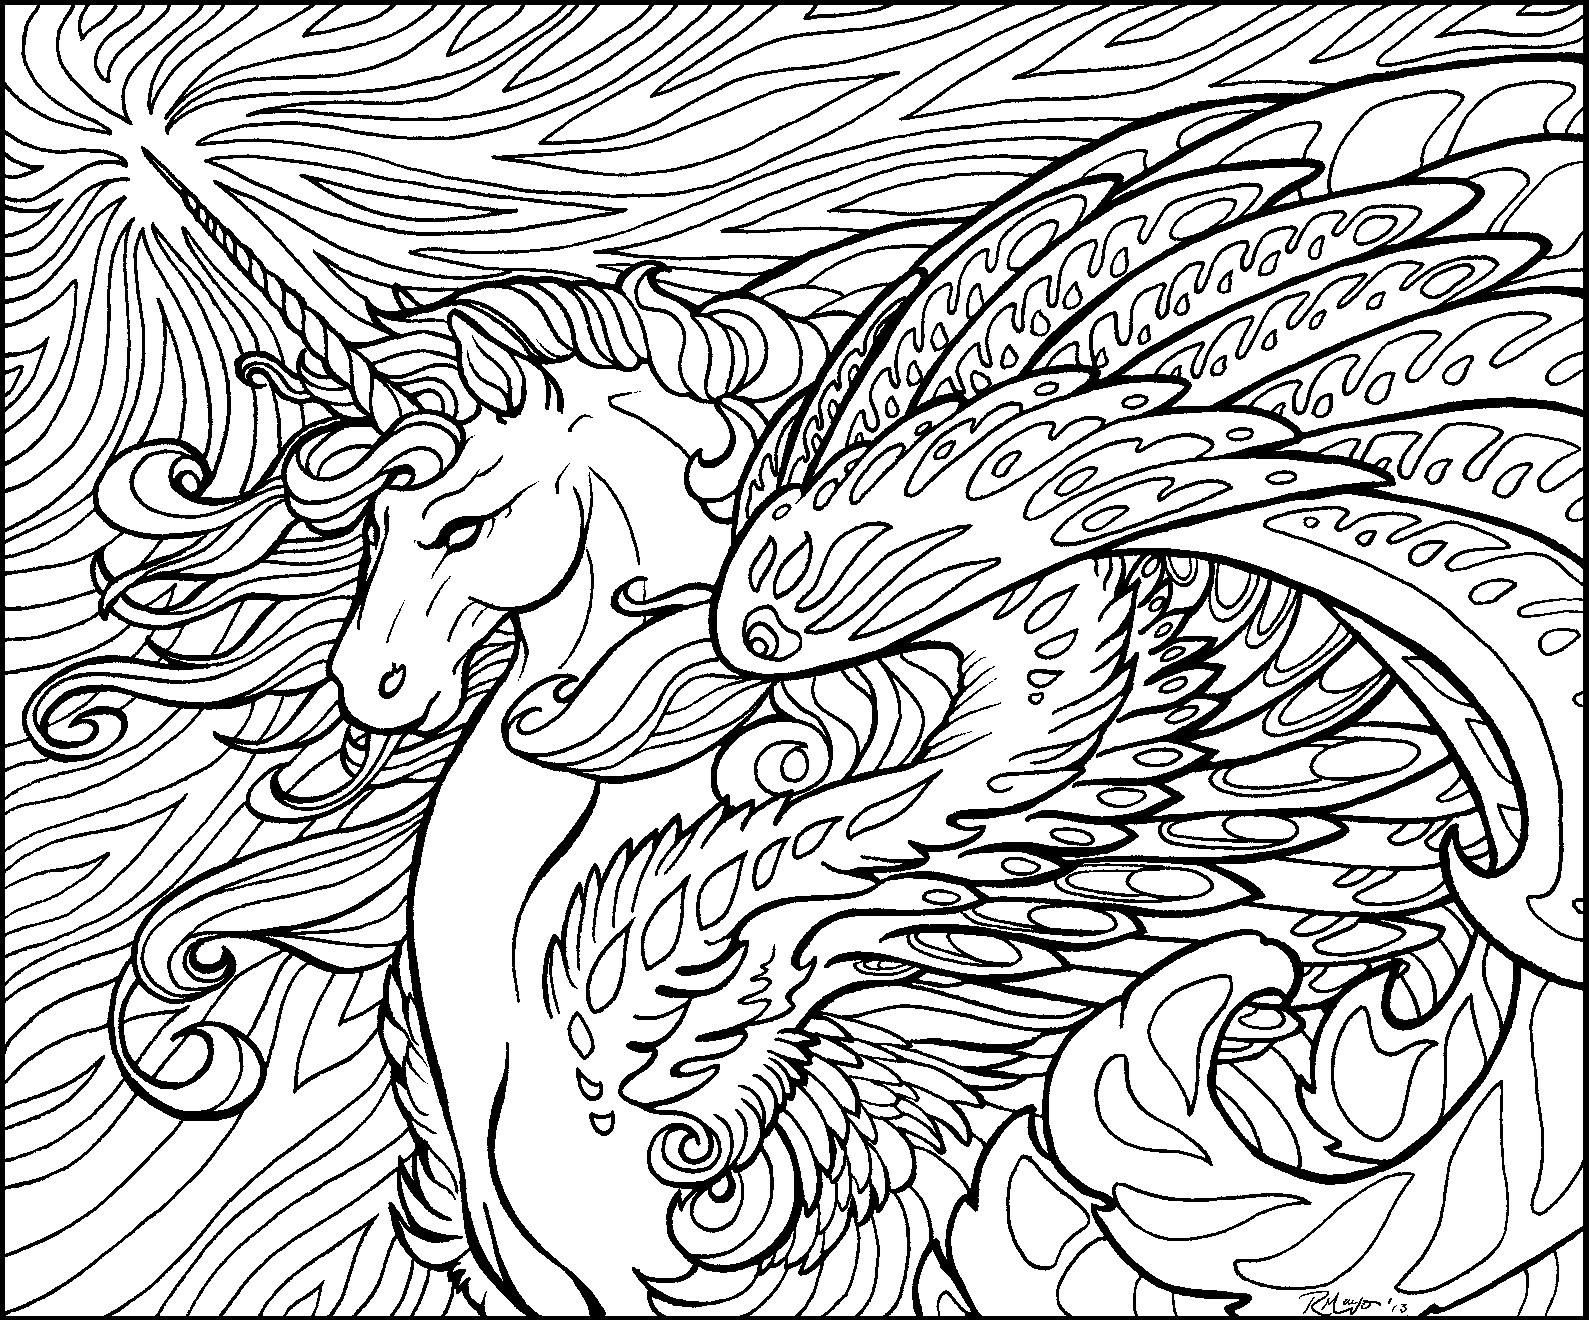 hard unicorn coloring pages Last Unicorn Hard Coloring Mythical One horned Creature Unicorn  hard unicorn coloring pages